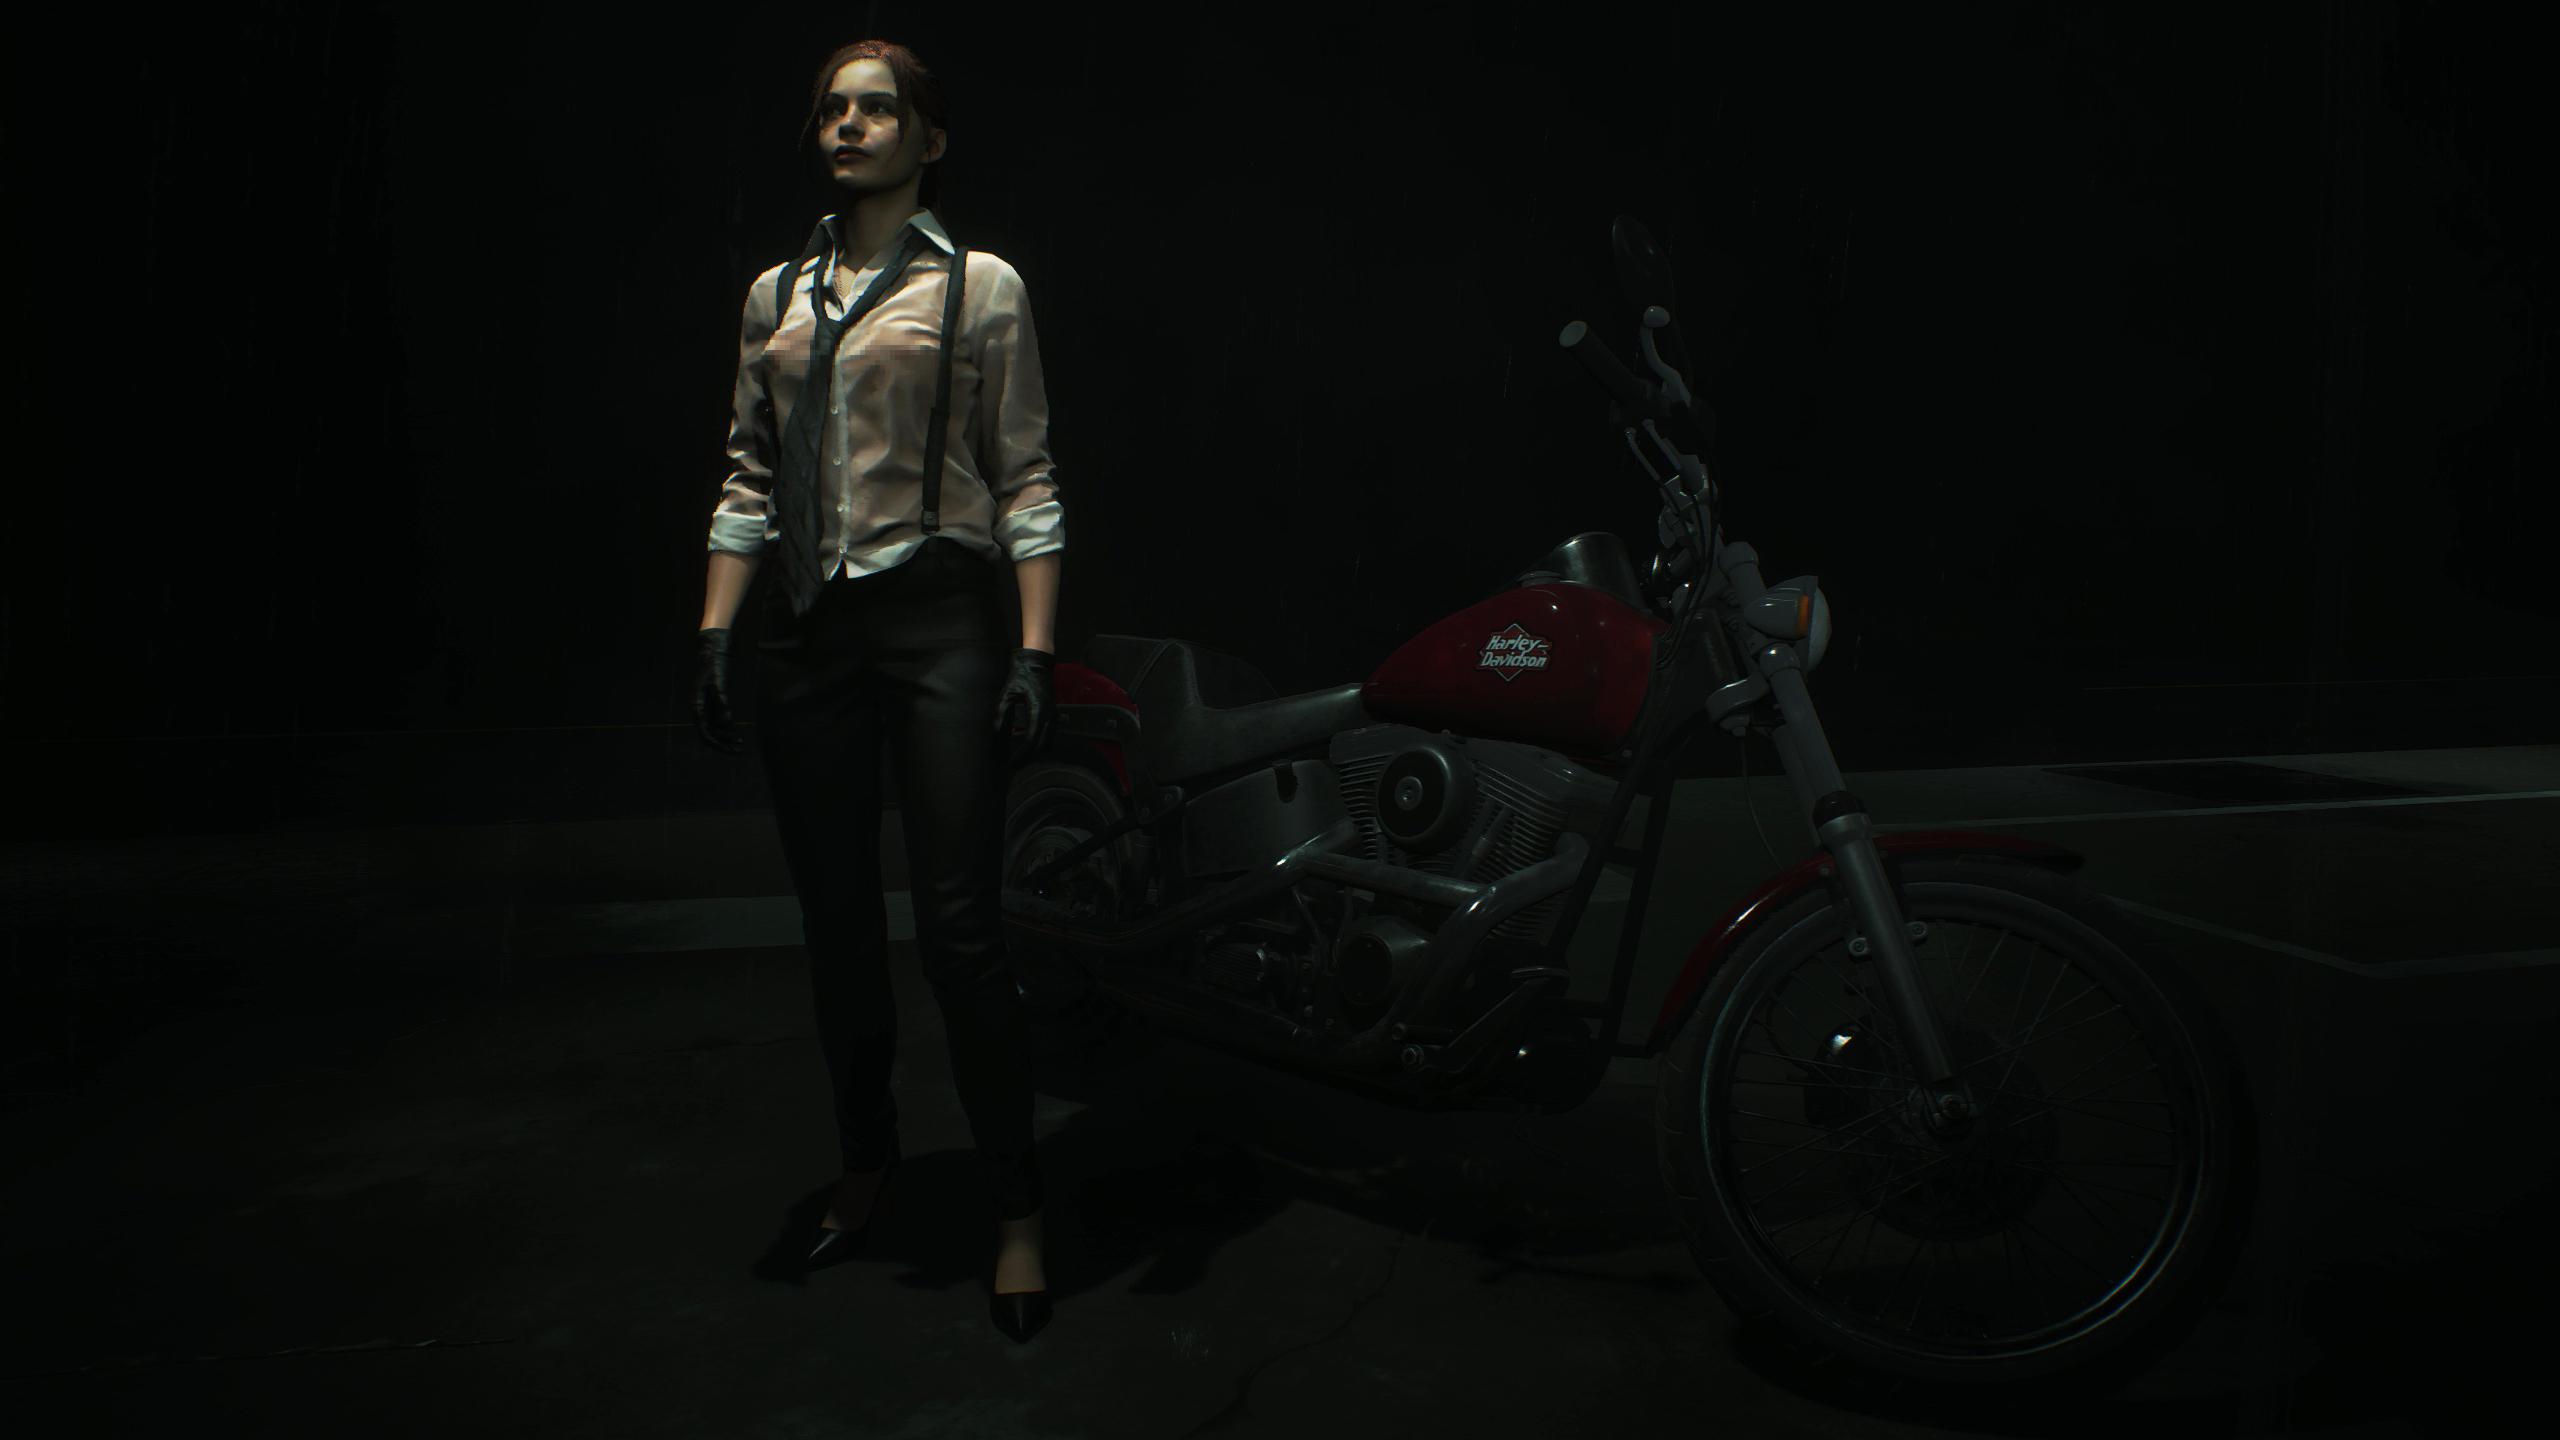 Steam Workshop Resident Evil 2 Remake Claire Redfield